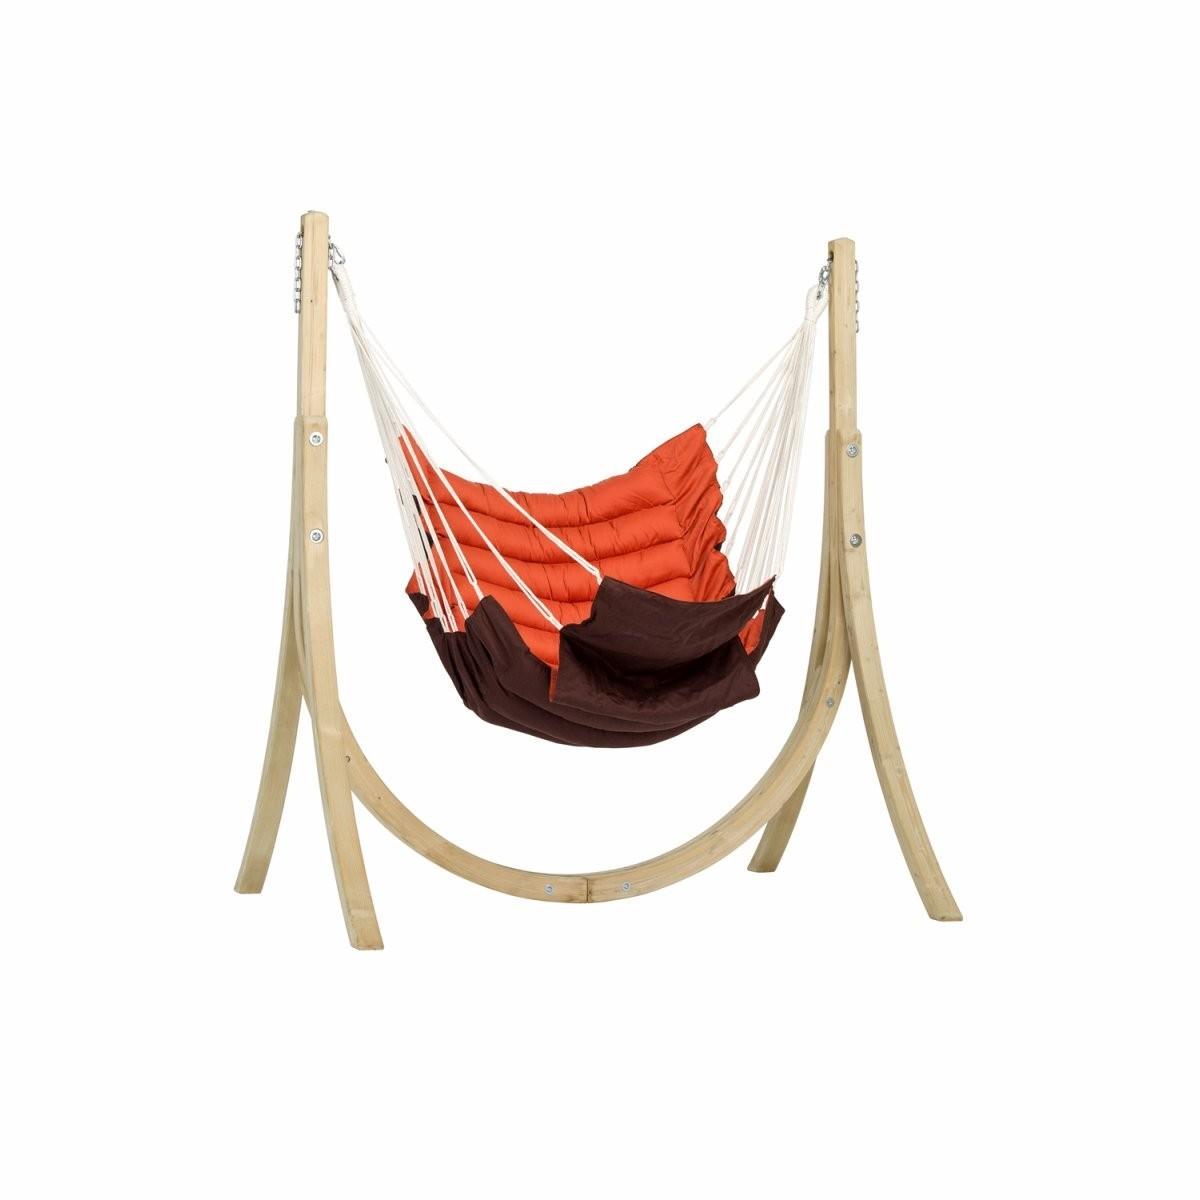 amazonas set support taurus hamac chaise terracotta